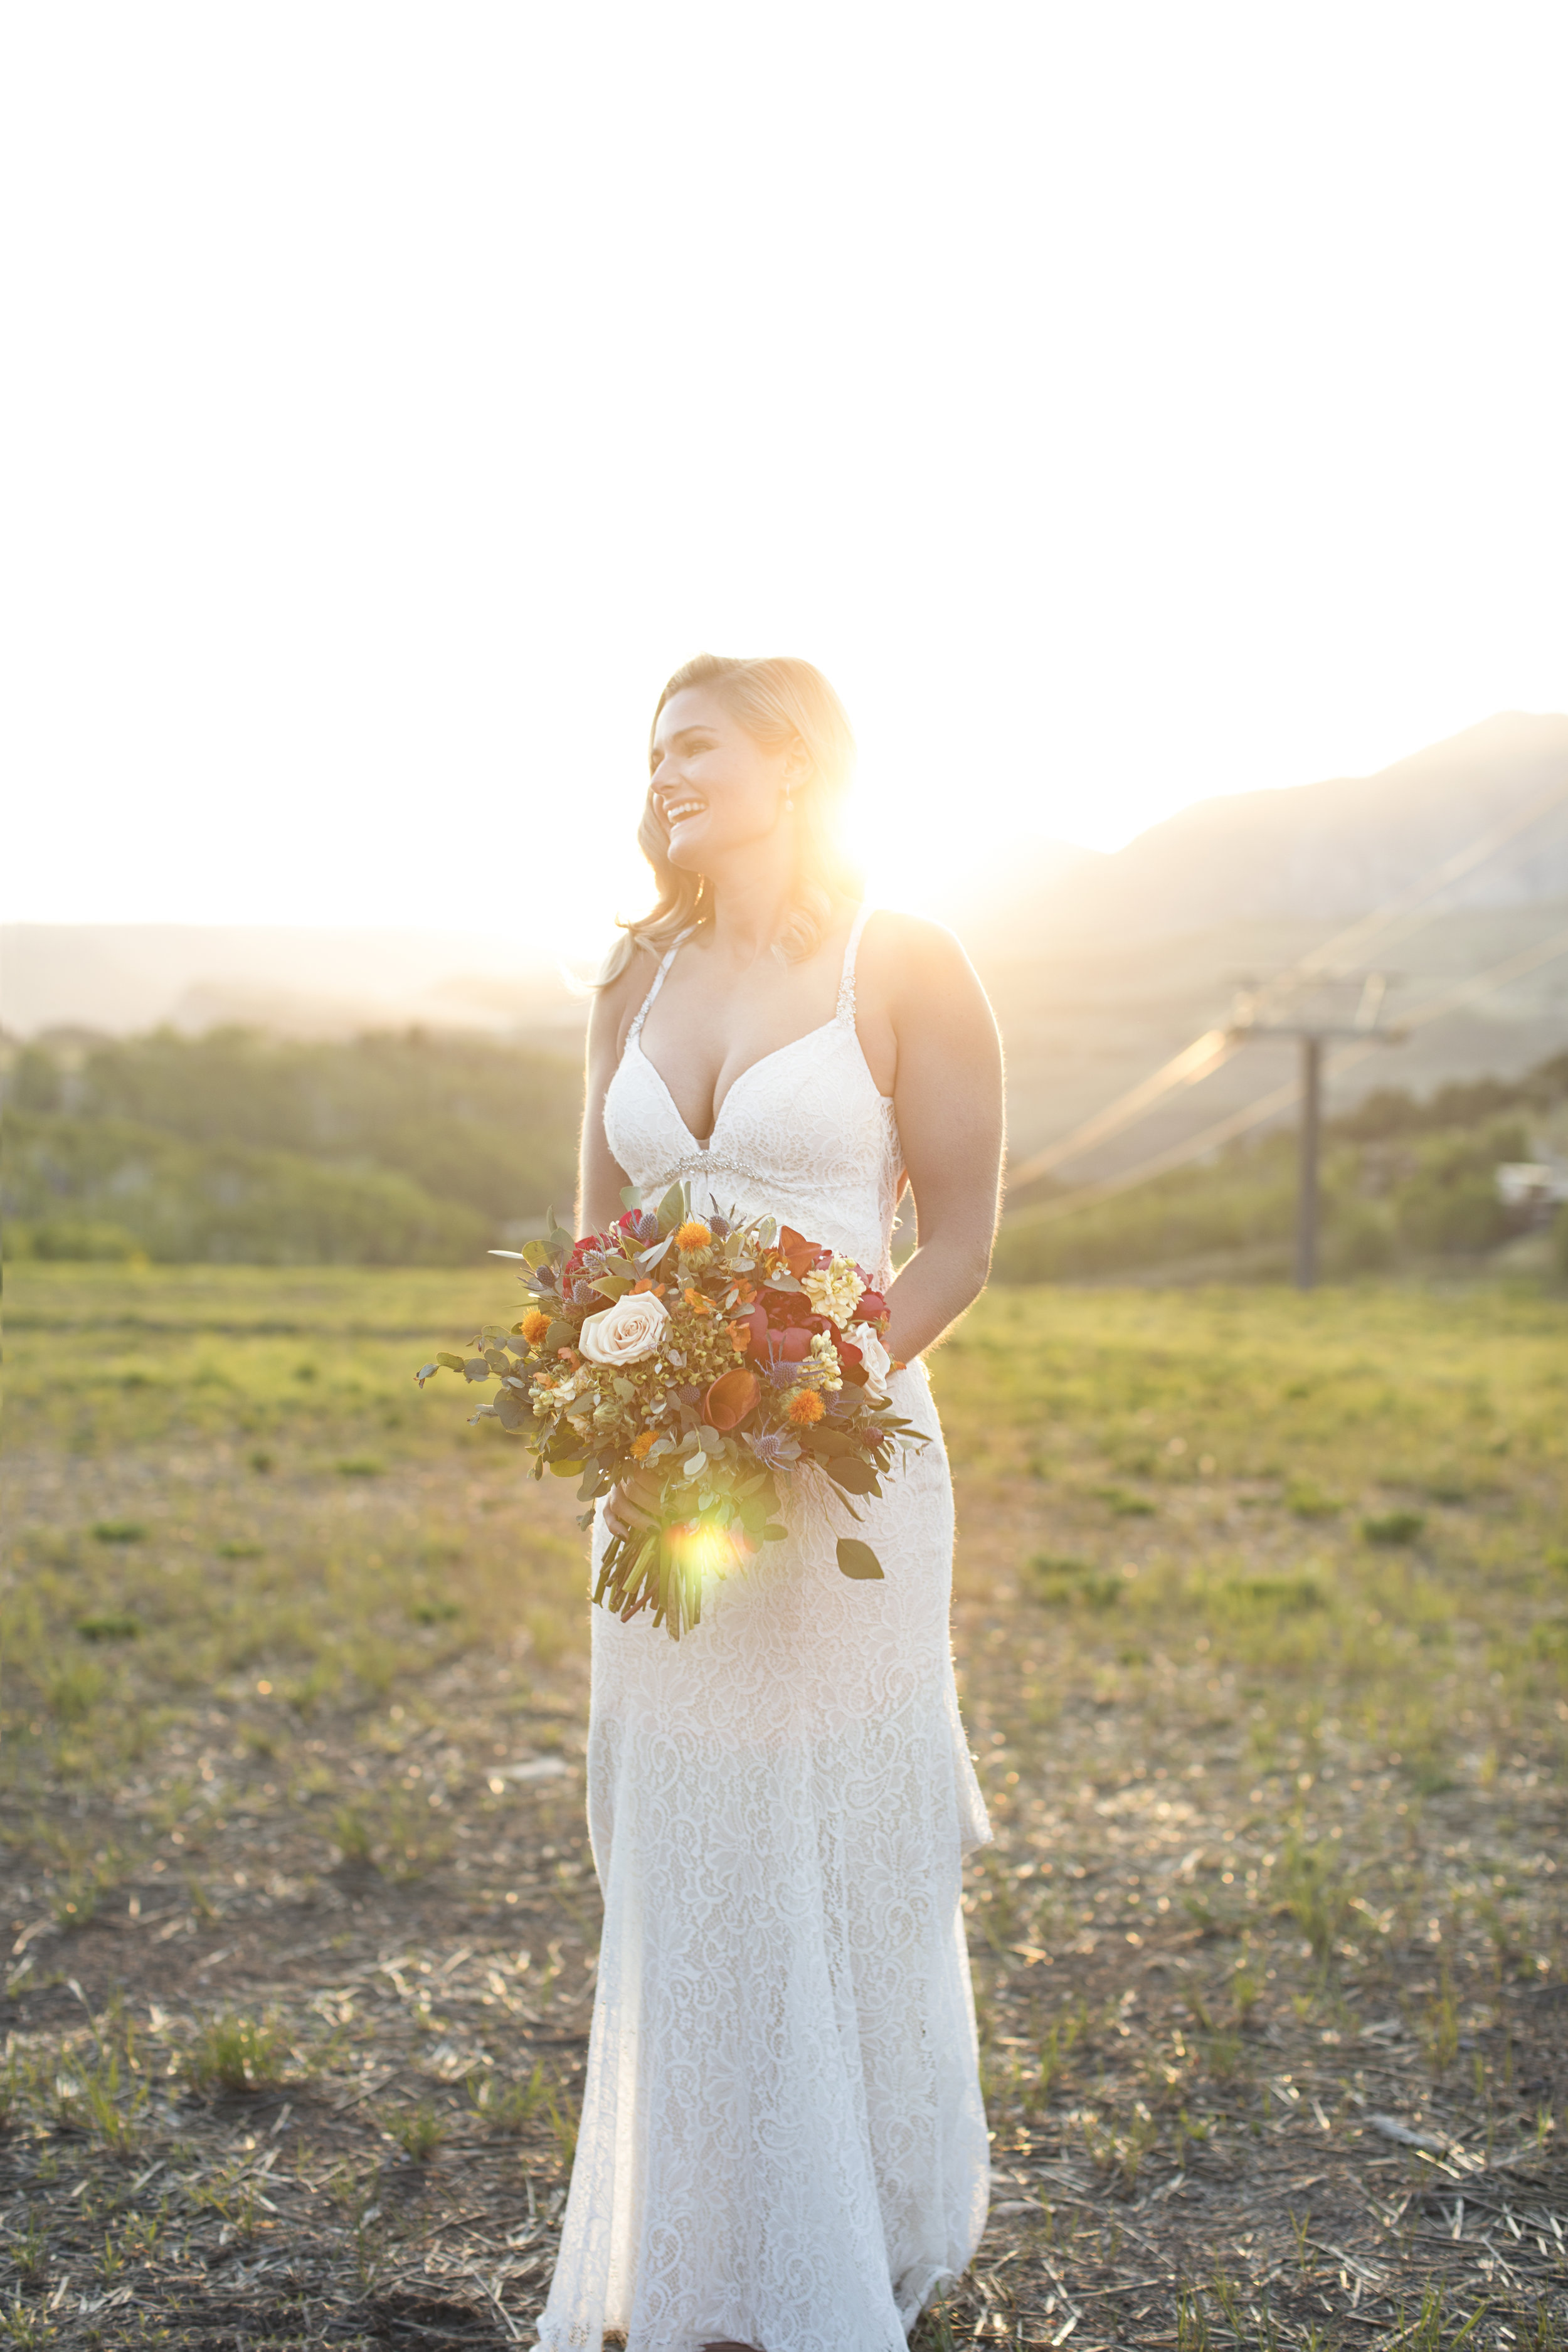 Bride laugh sunset.jpg